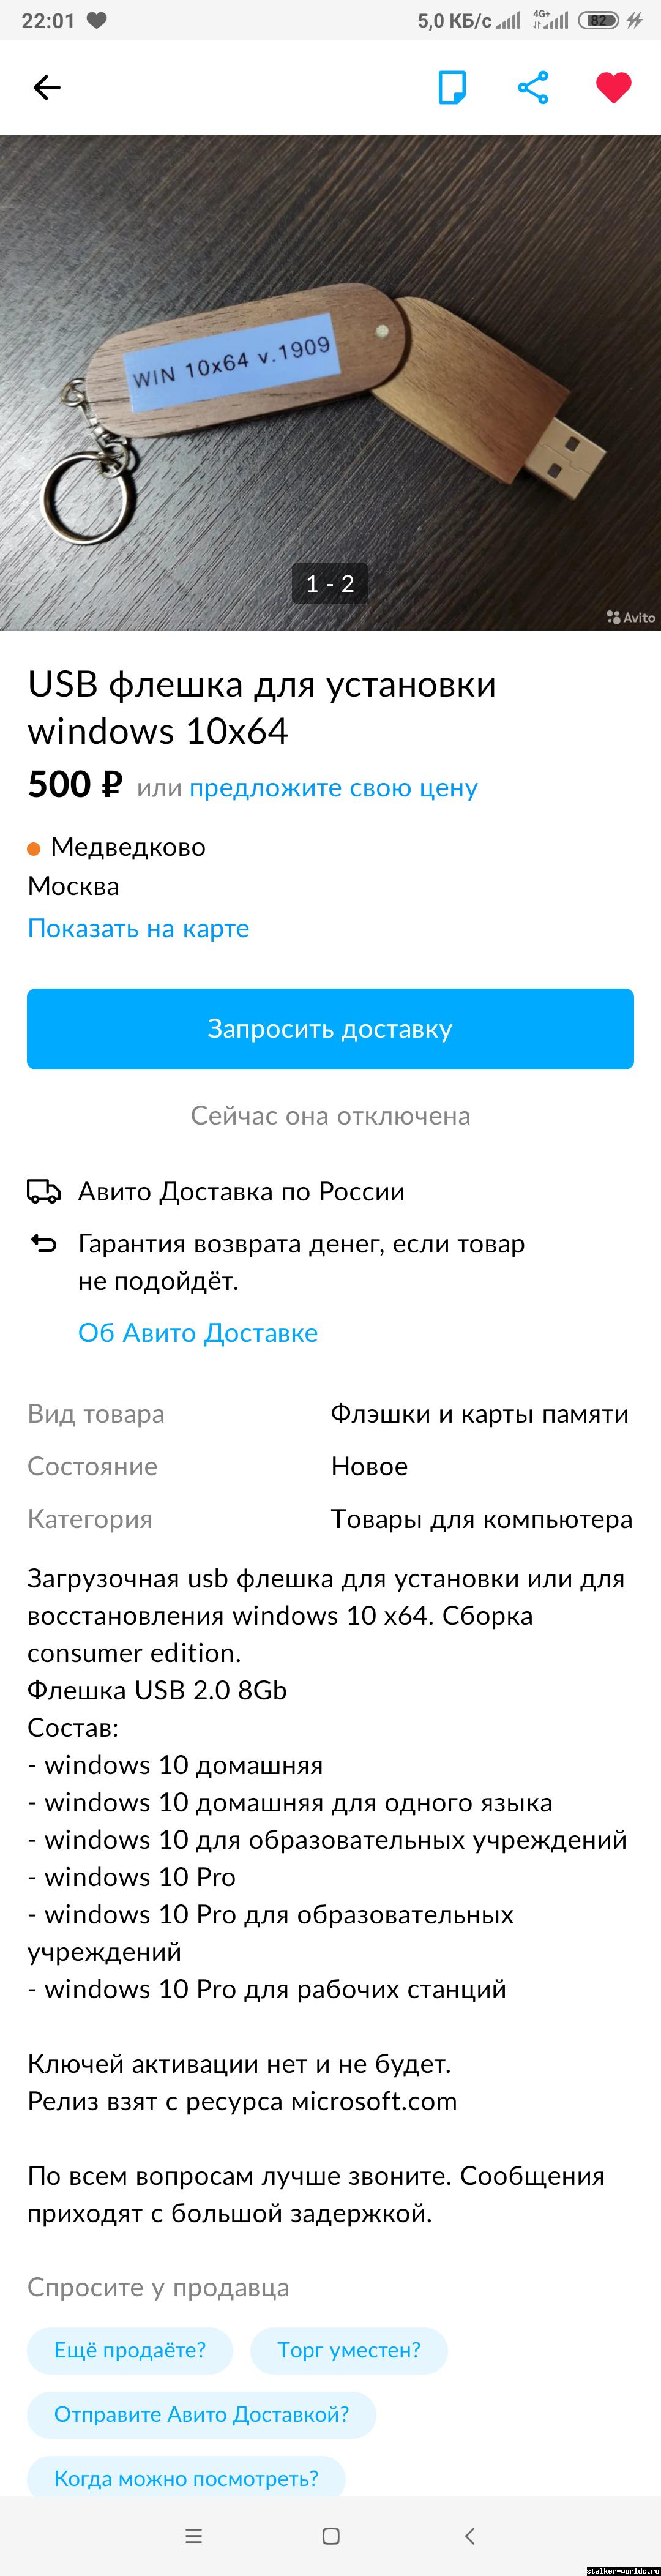 sw_1633460806__screenshot_2021-10-05-22-